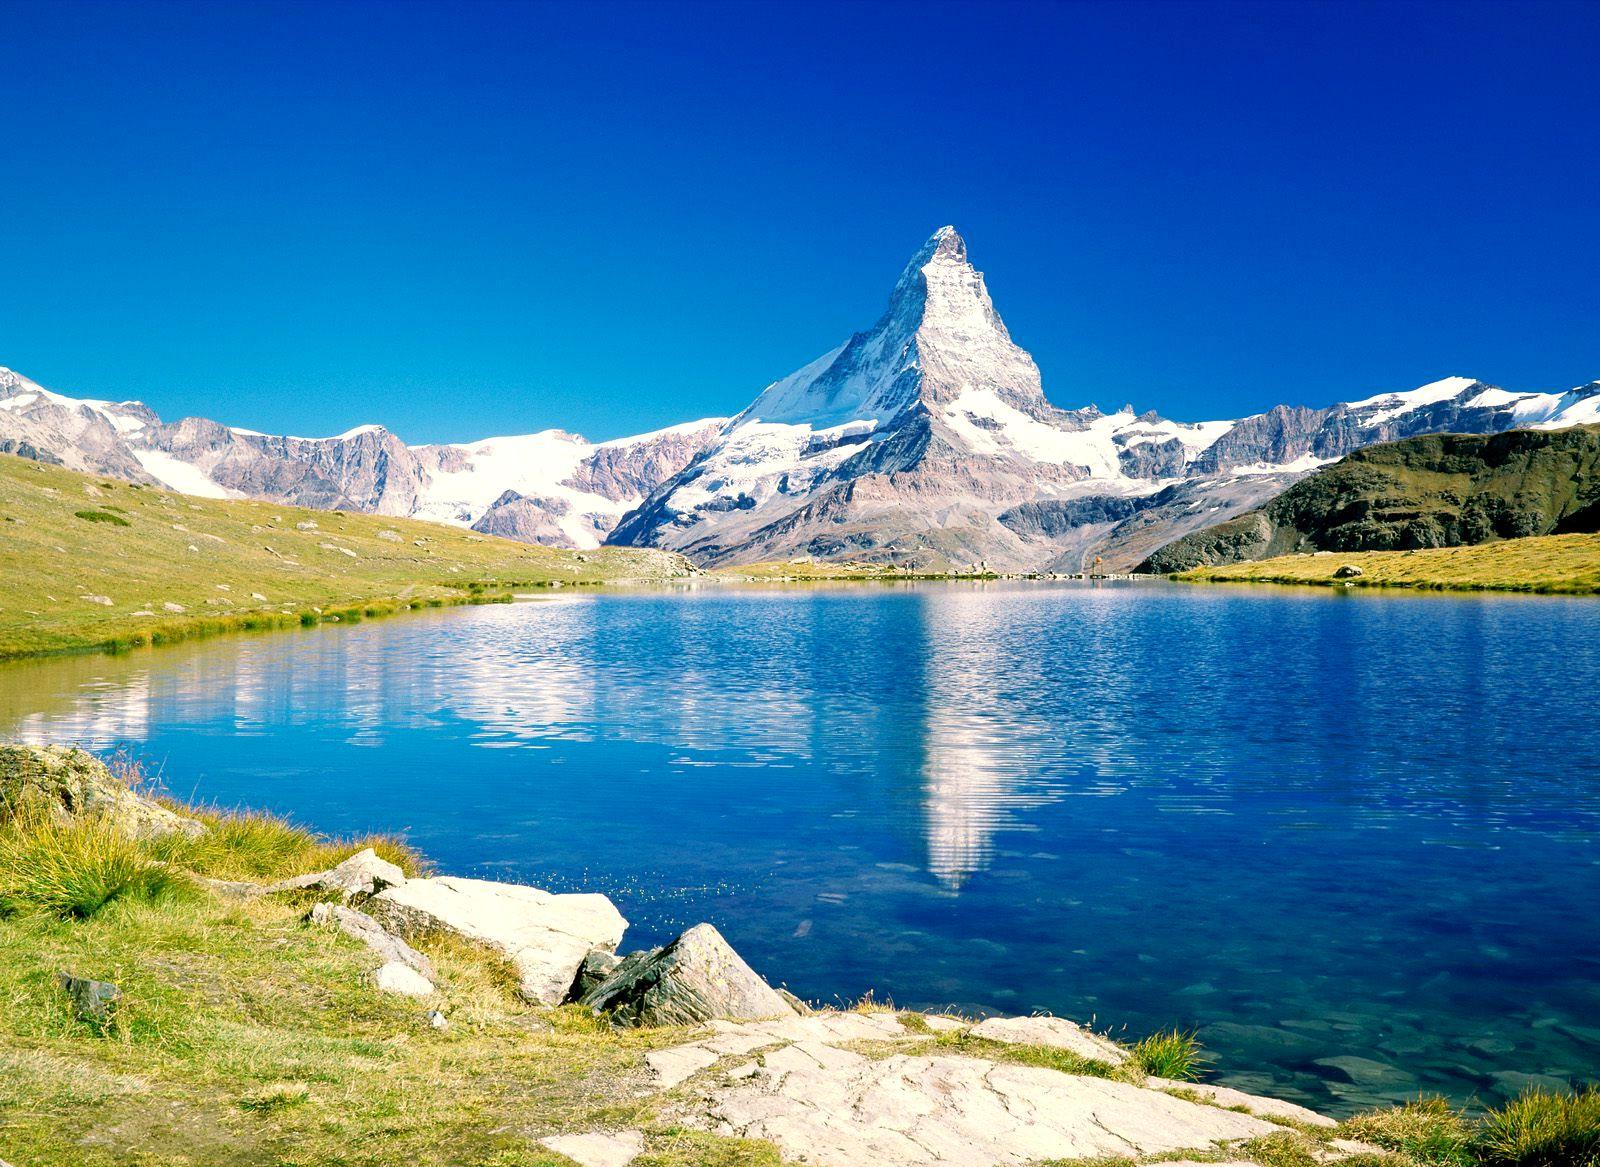 горы Маттахорн, Швейцарские альпы, Швейцария